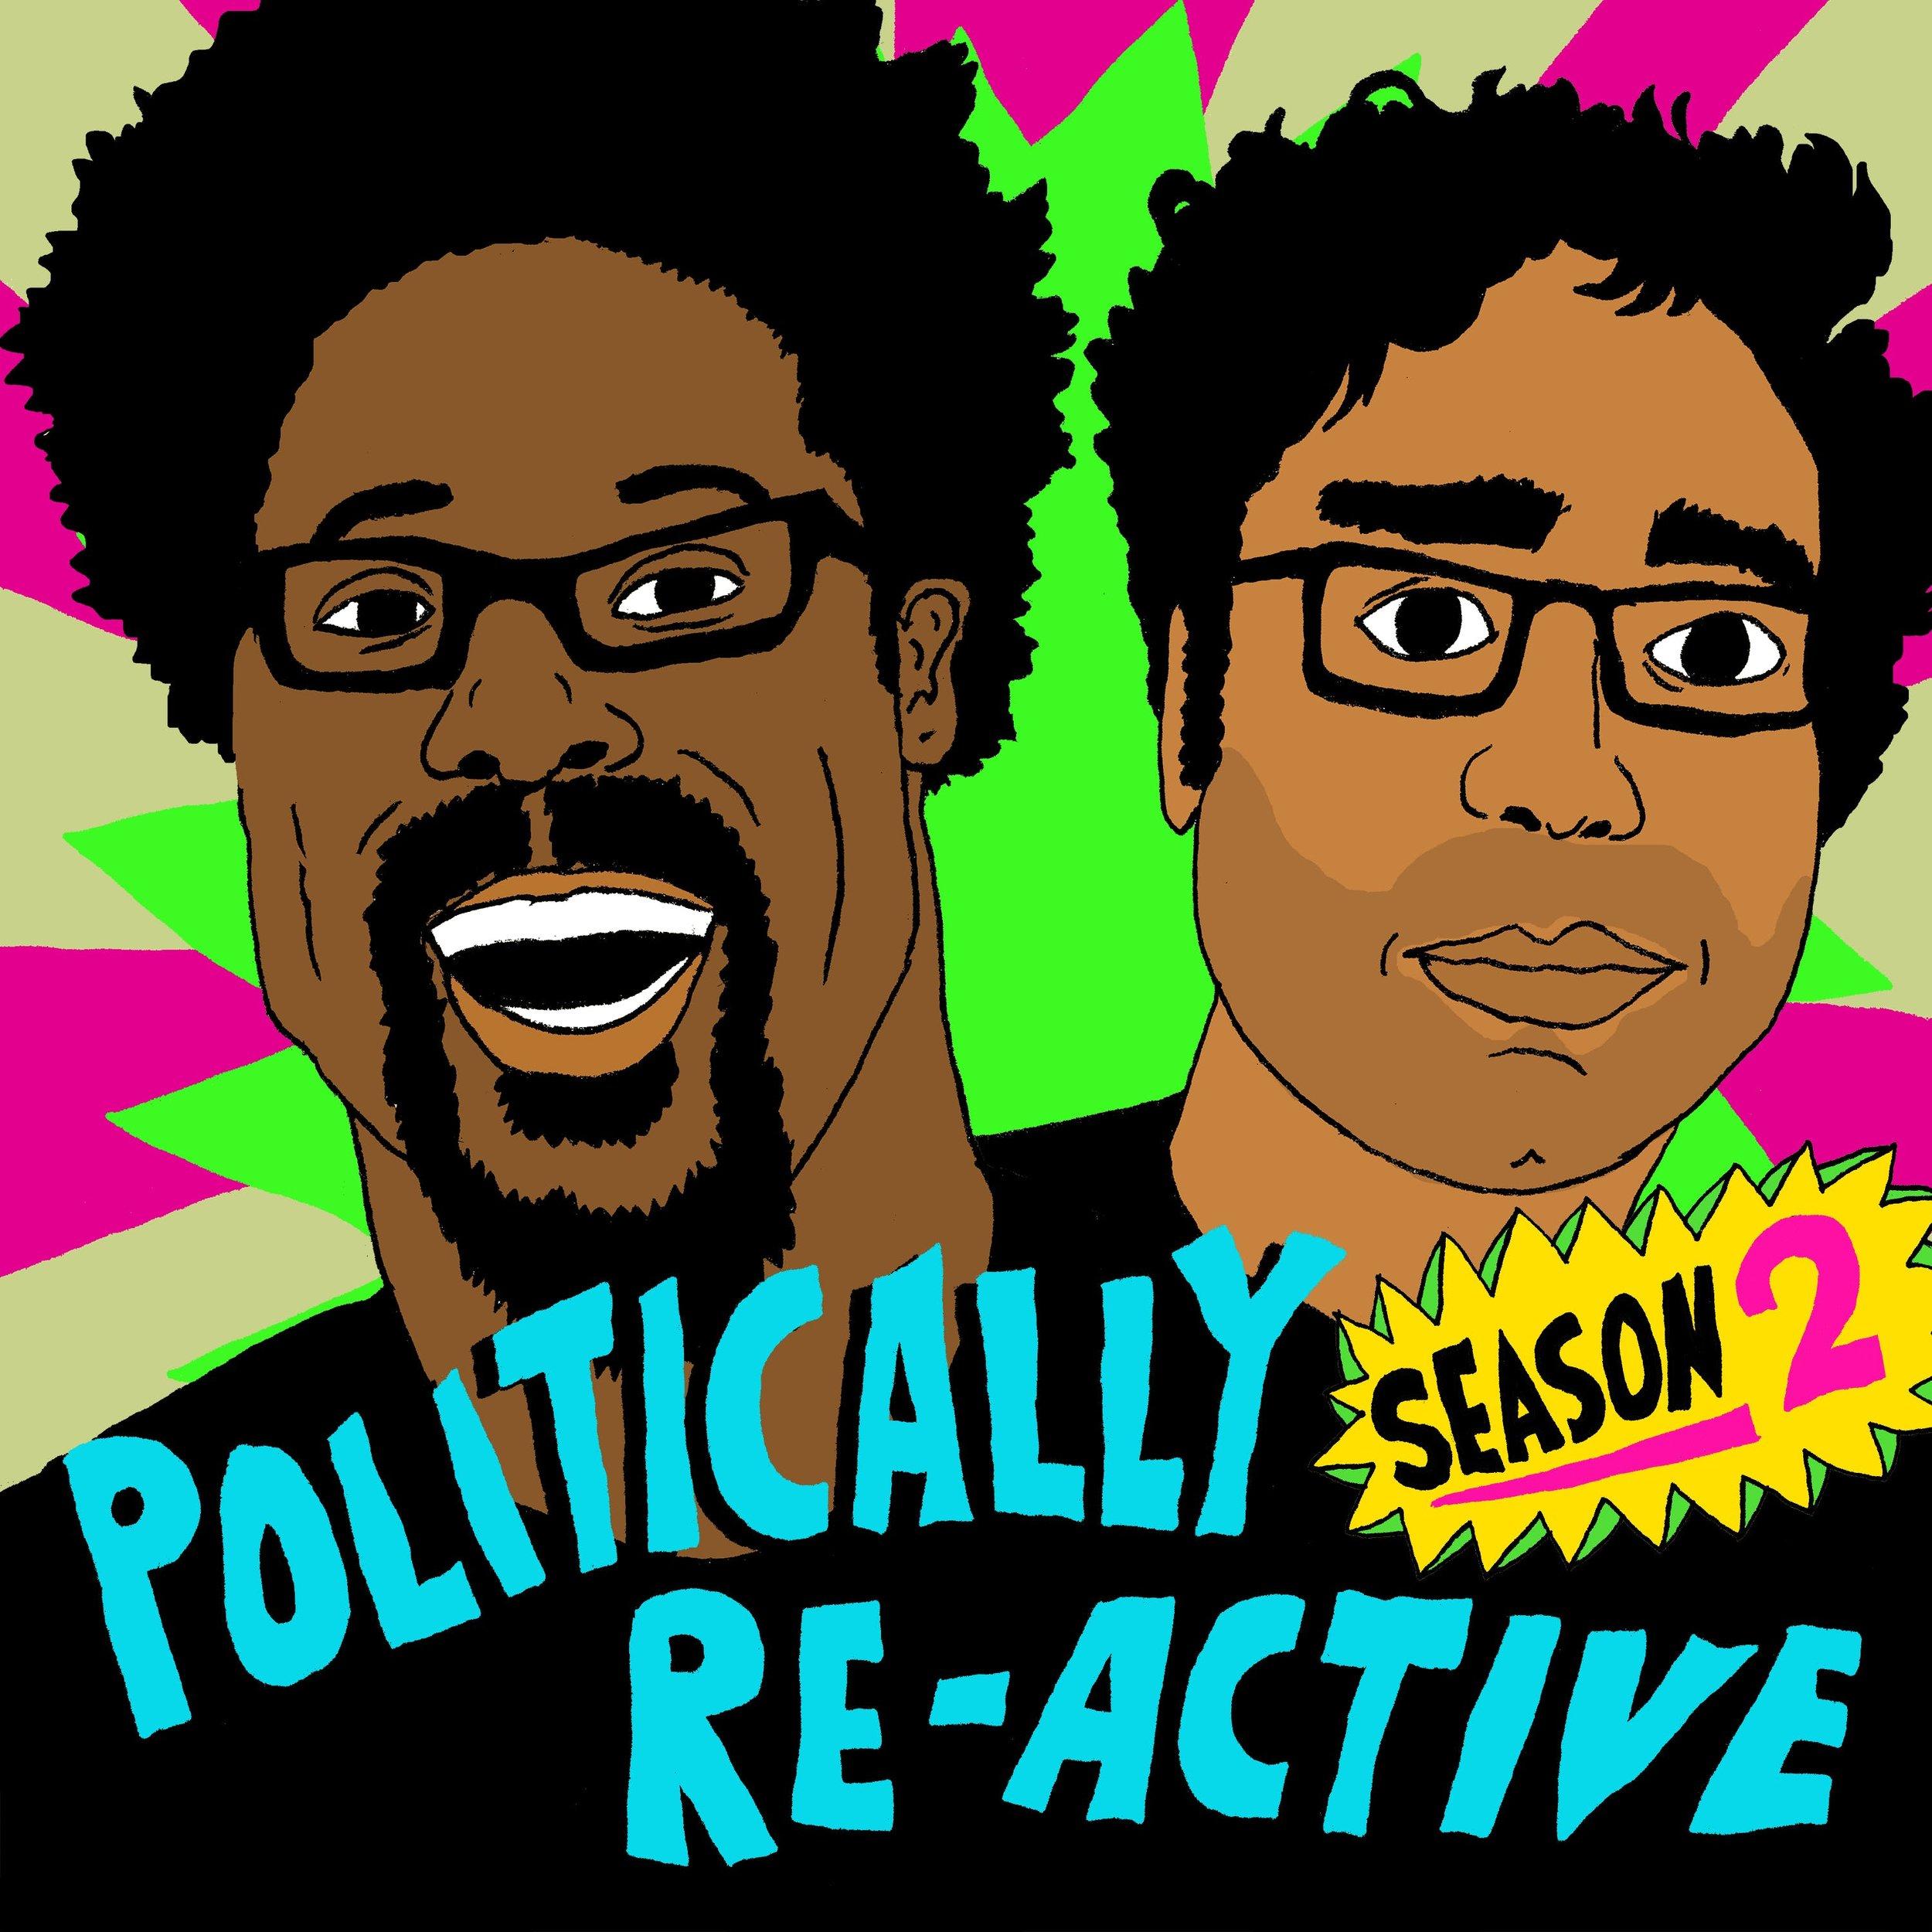 WKB_Podcast_PoliticallyReactive_2jpg.jpg